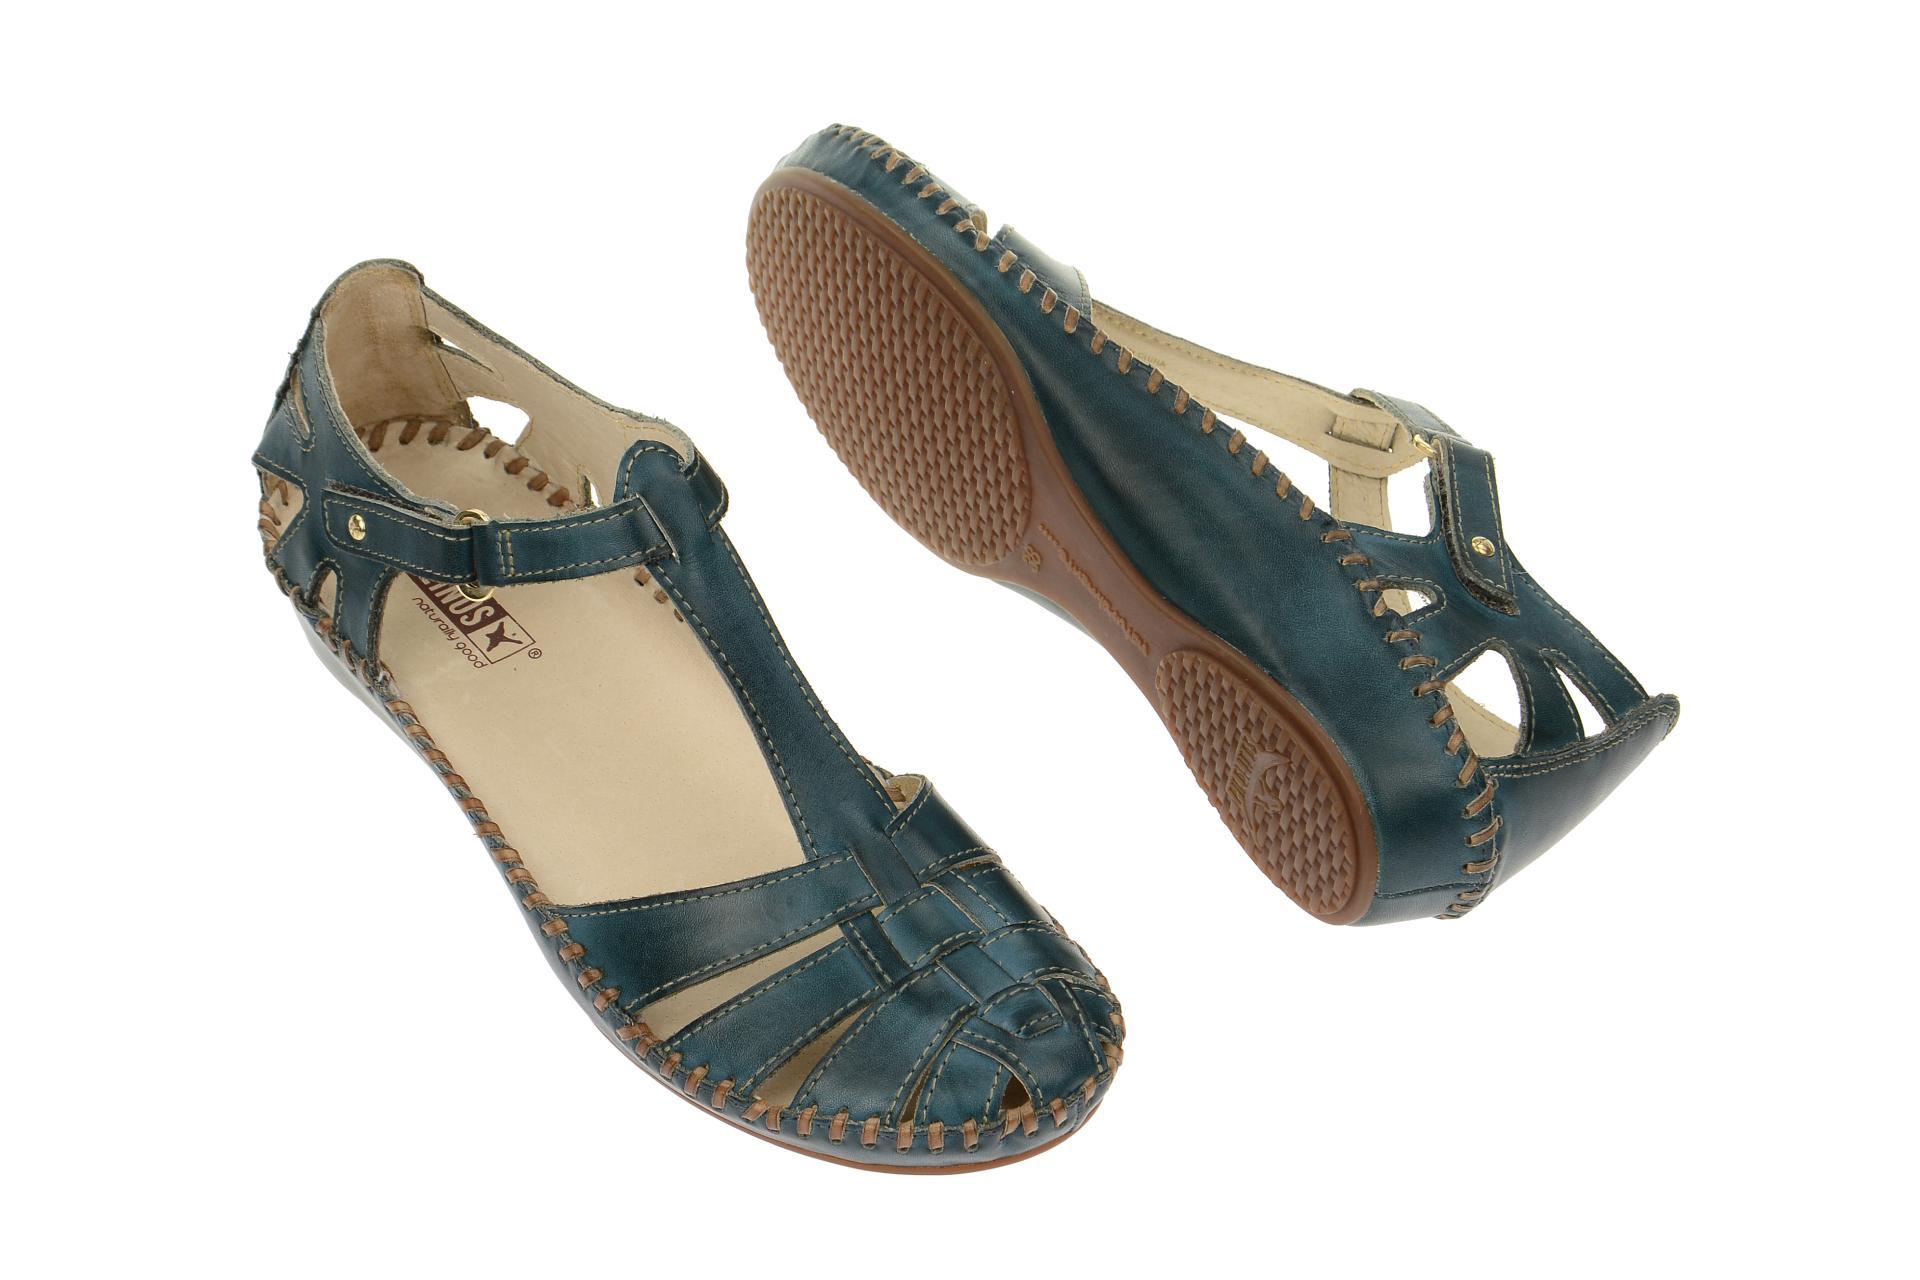 pikolinos schuhe p vallarta gr n damen sandale sandaletten 655 7434 petrol neu ebay. Black Bedroom Furniture Sets. Home Design Ideas